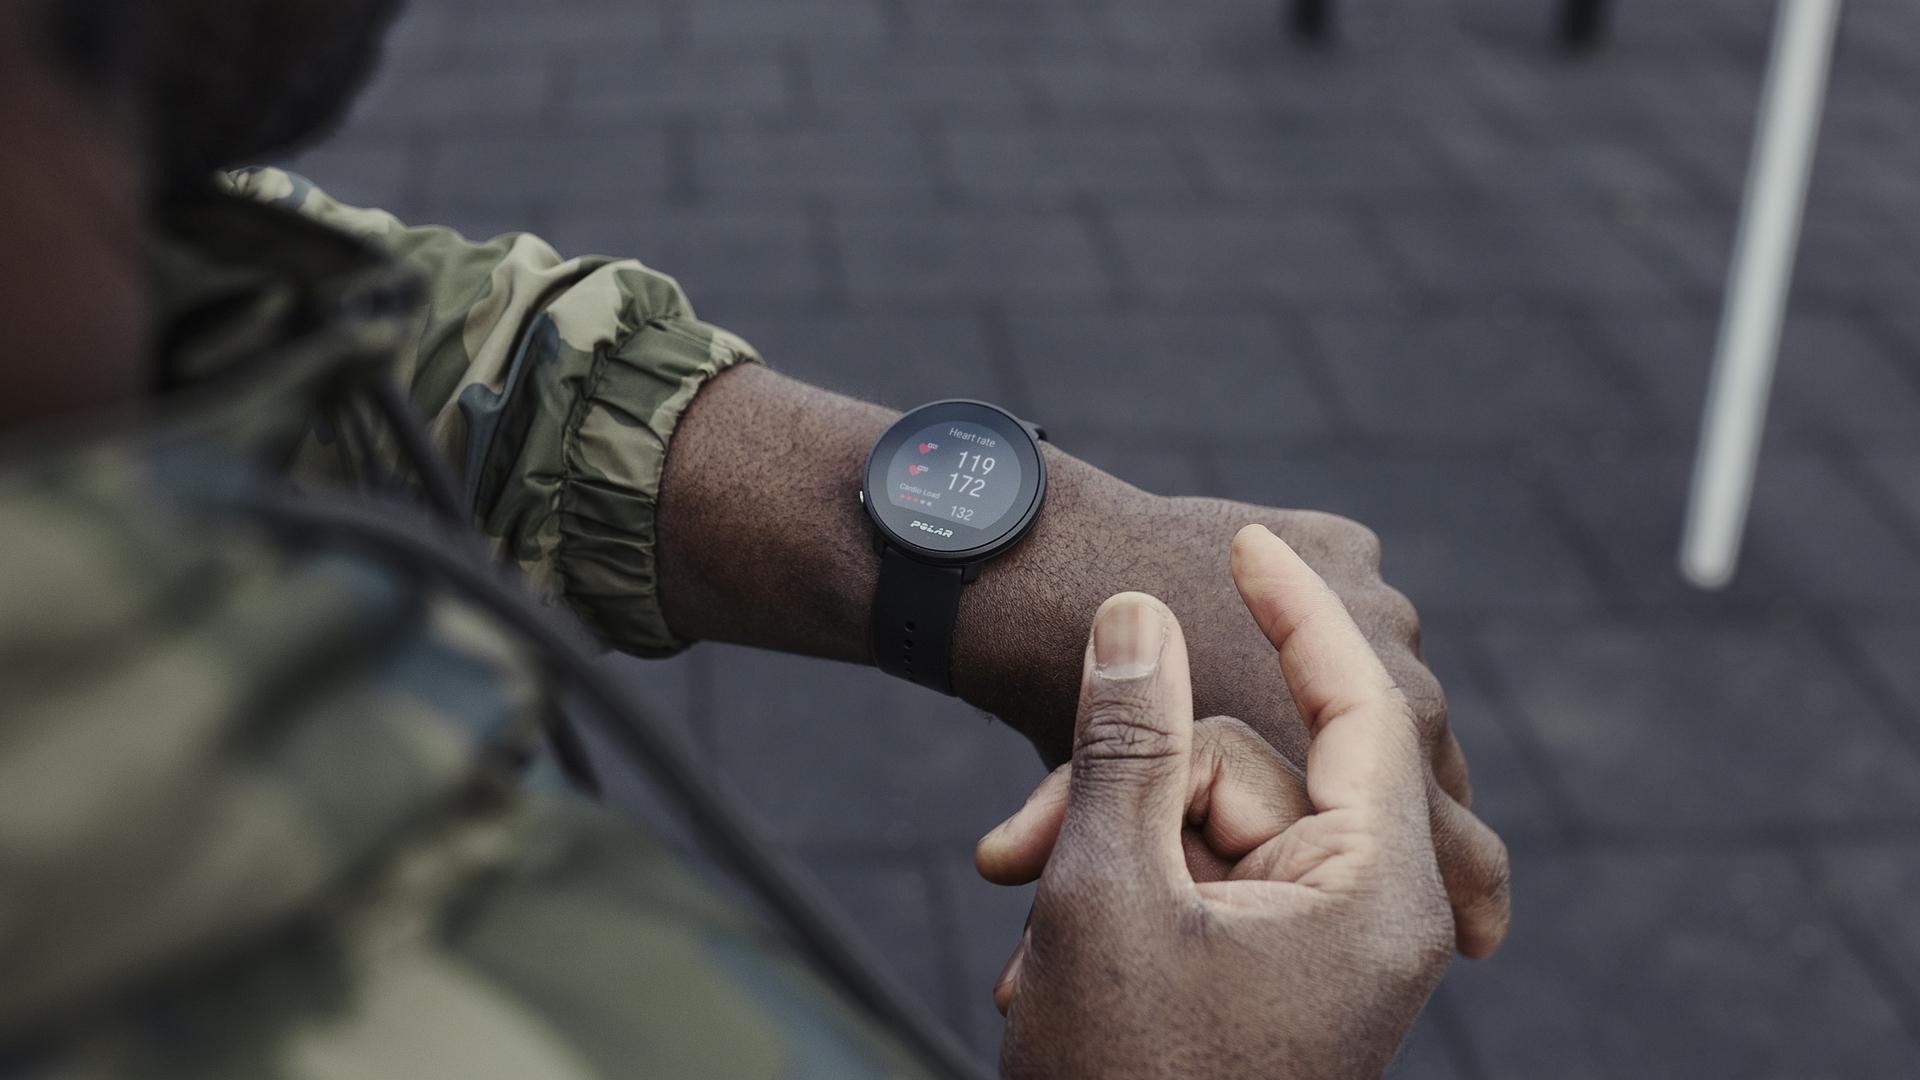 polar unite fitness watch on wrist